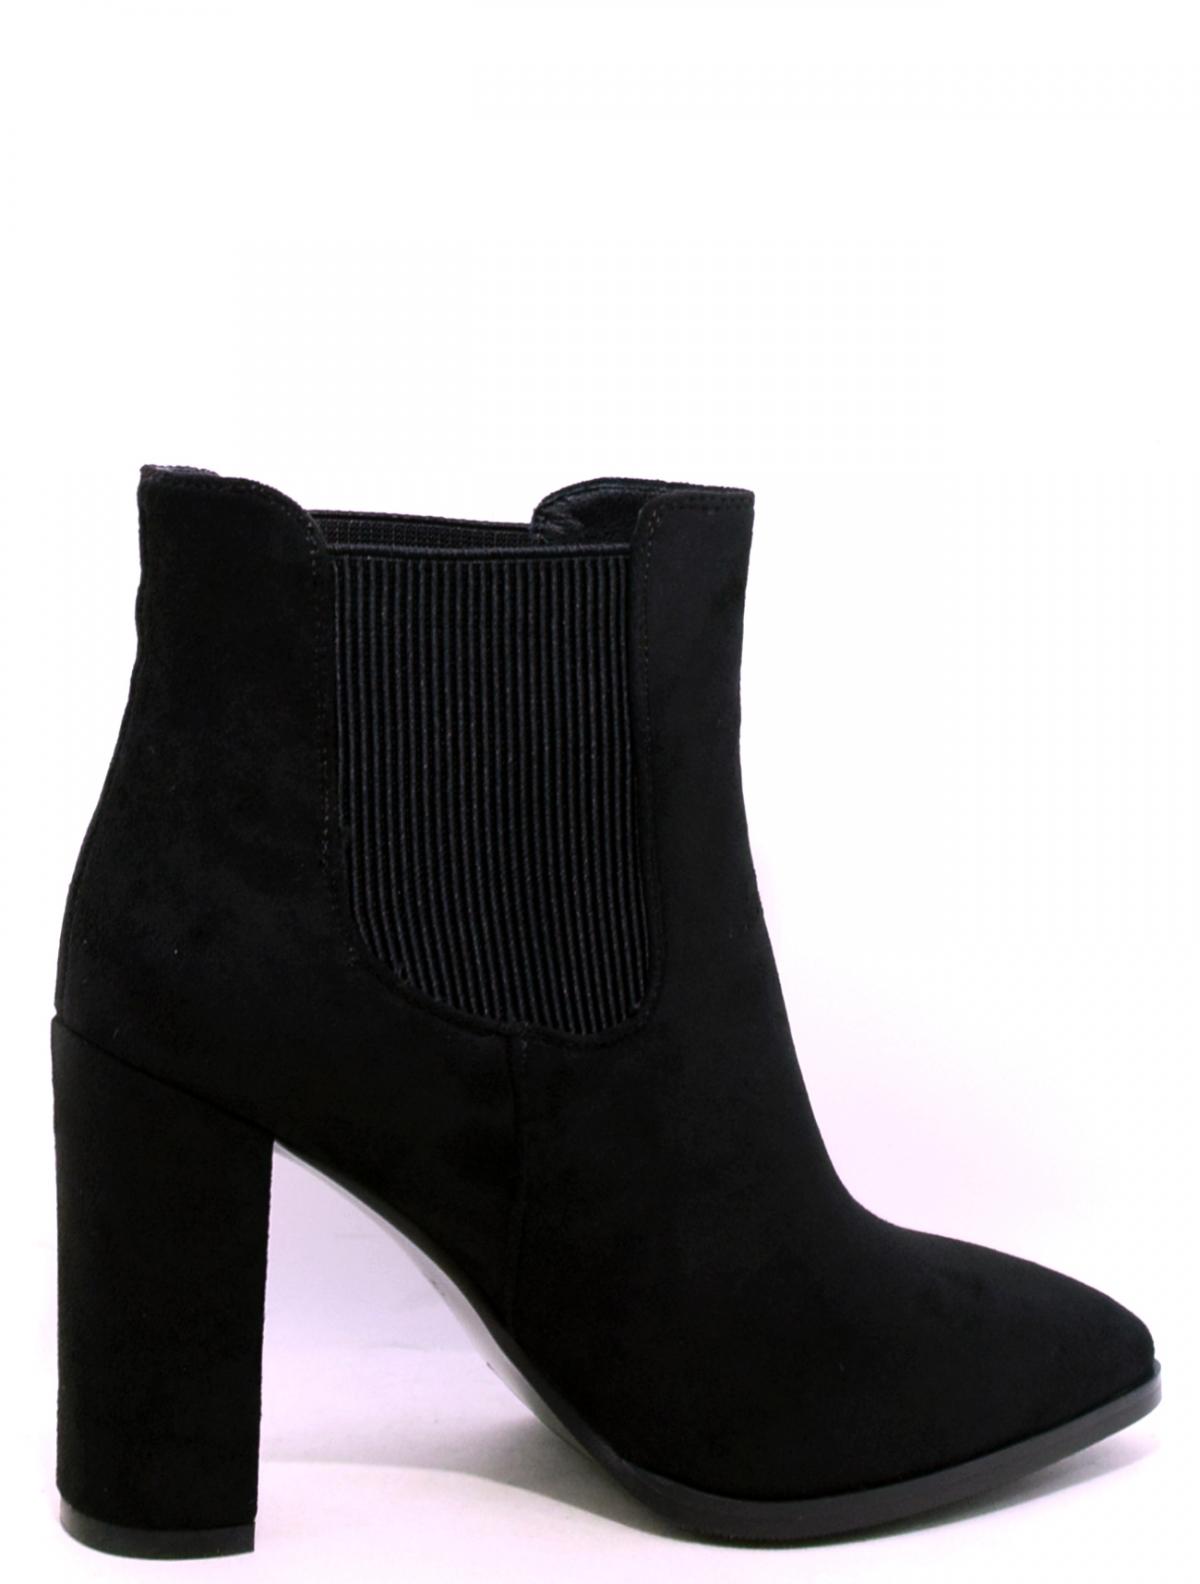 Admlis 9835 женские ботинки